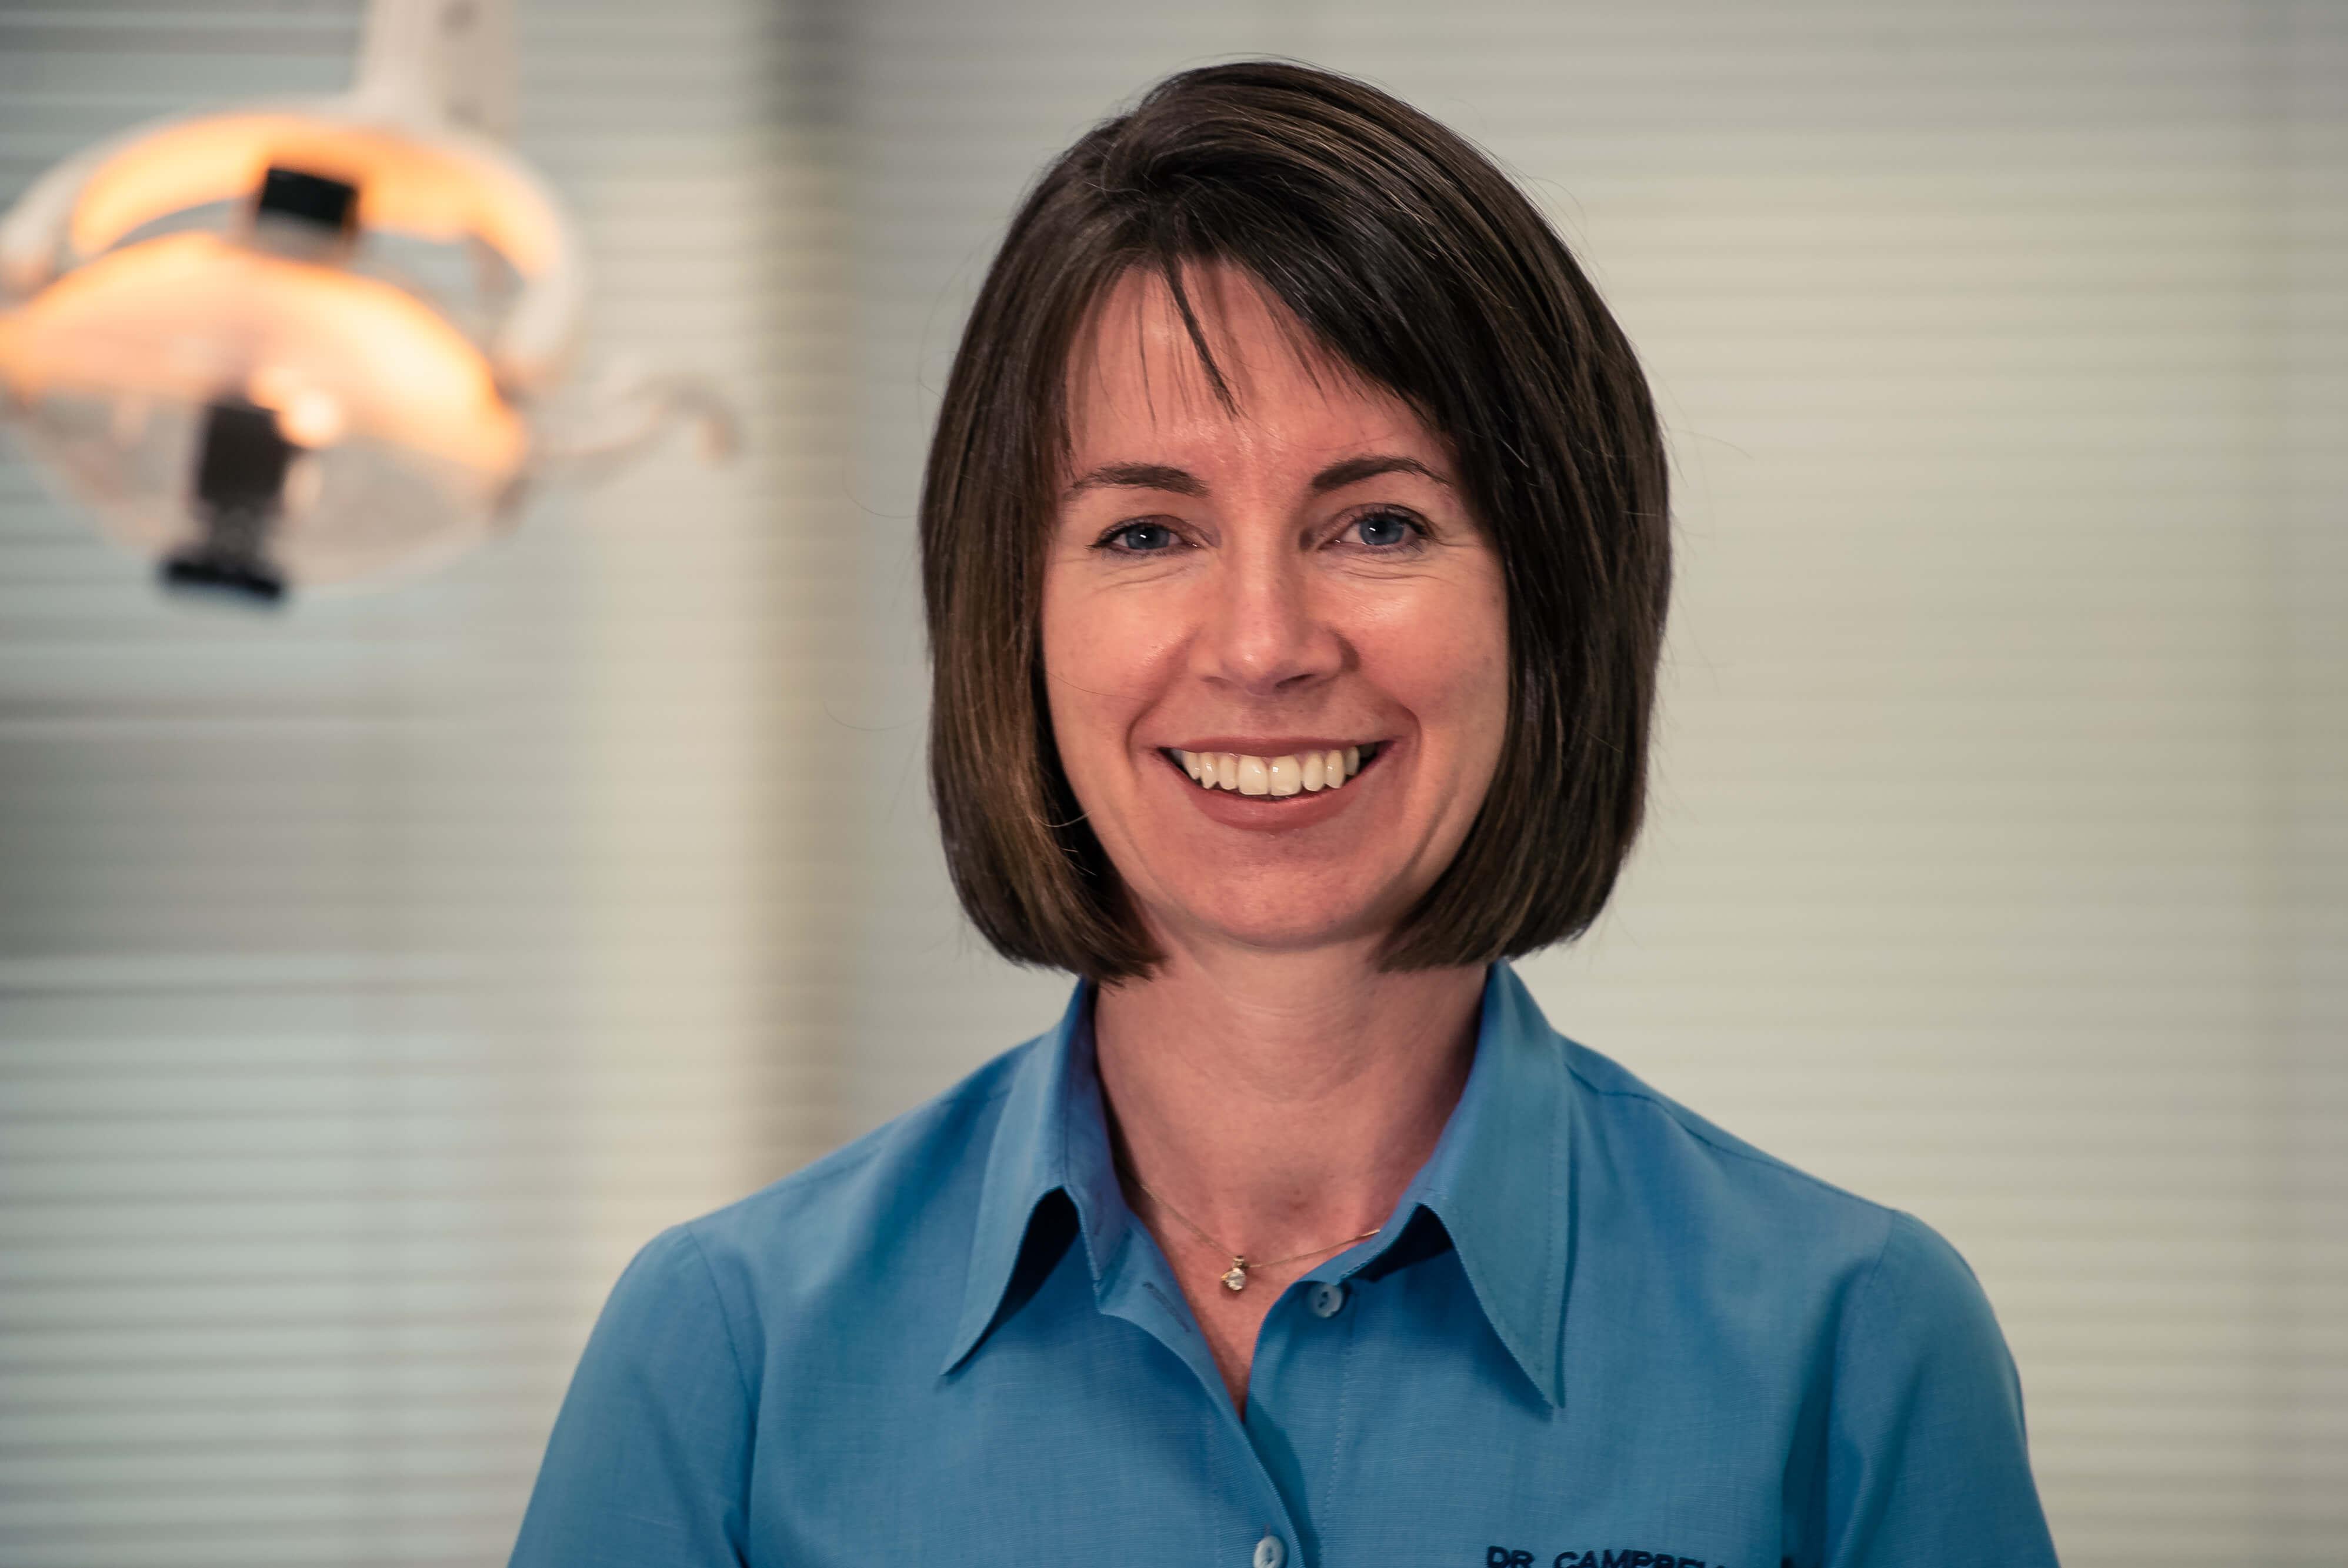 Dr. Karen Campbell